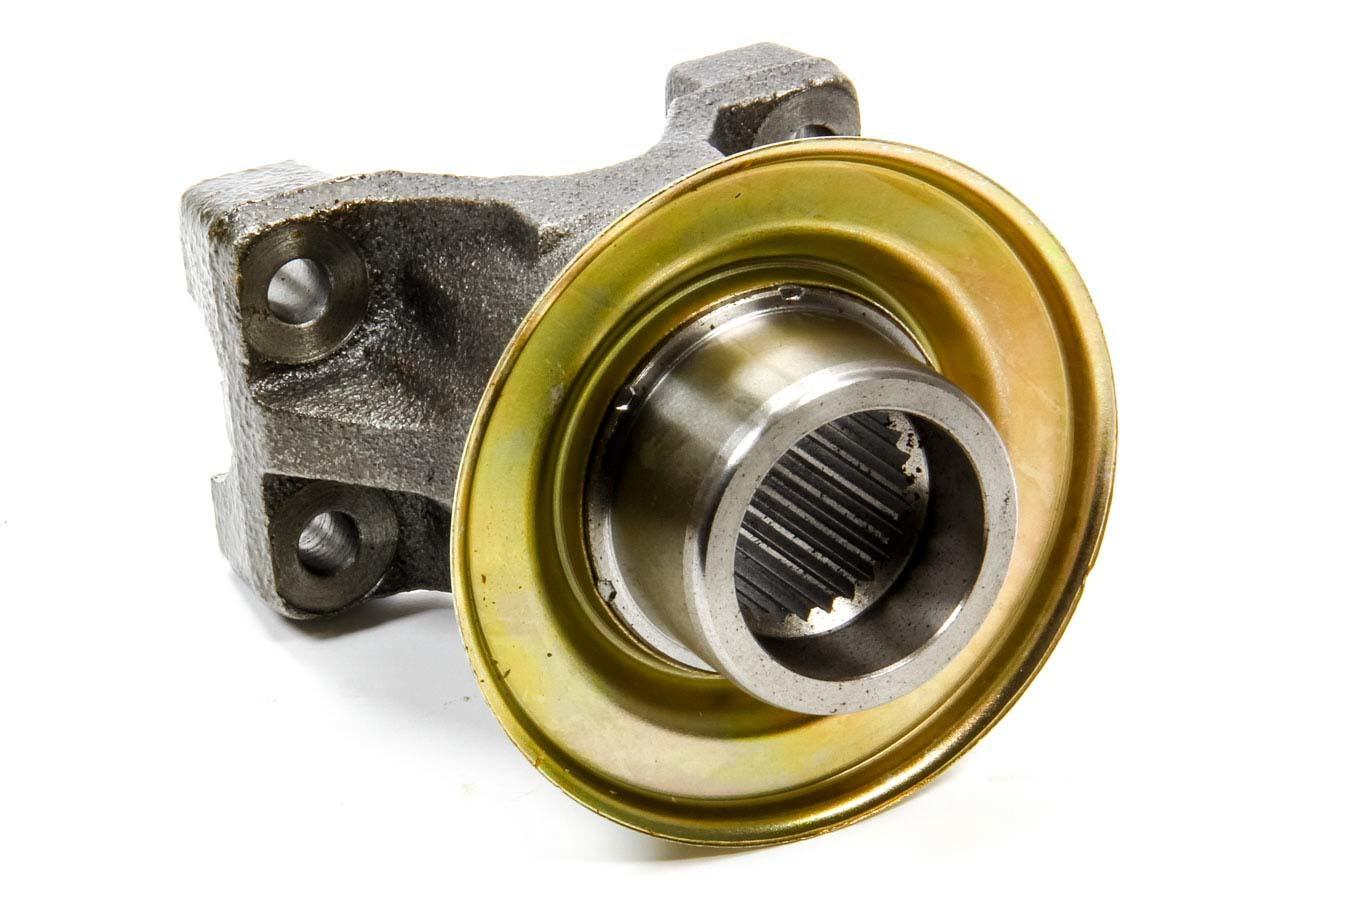 Precision Shaft Technologies 100011 Pinion Yoke, Steel, 28 Spline, Natural, 1310 U-Joint, Ford 9 in, Each